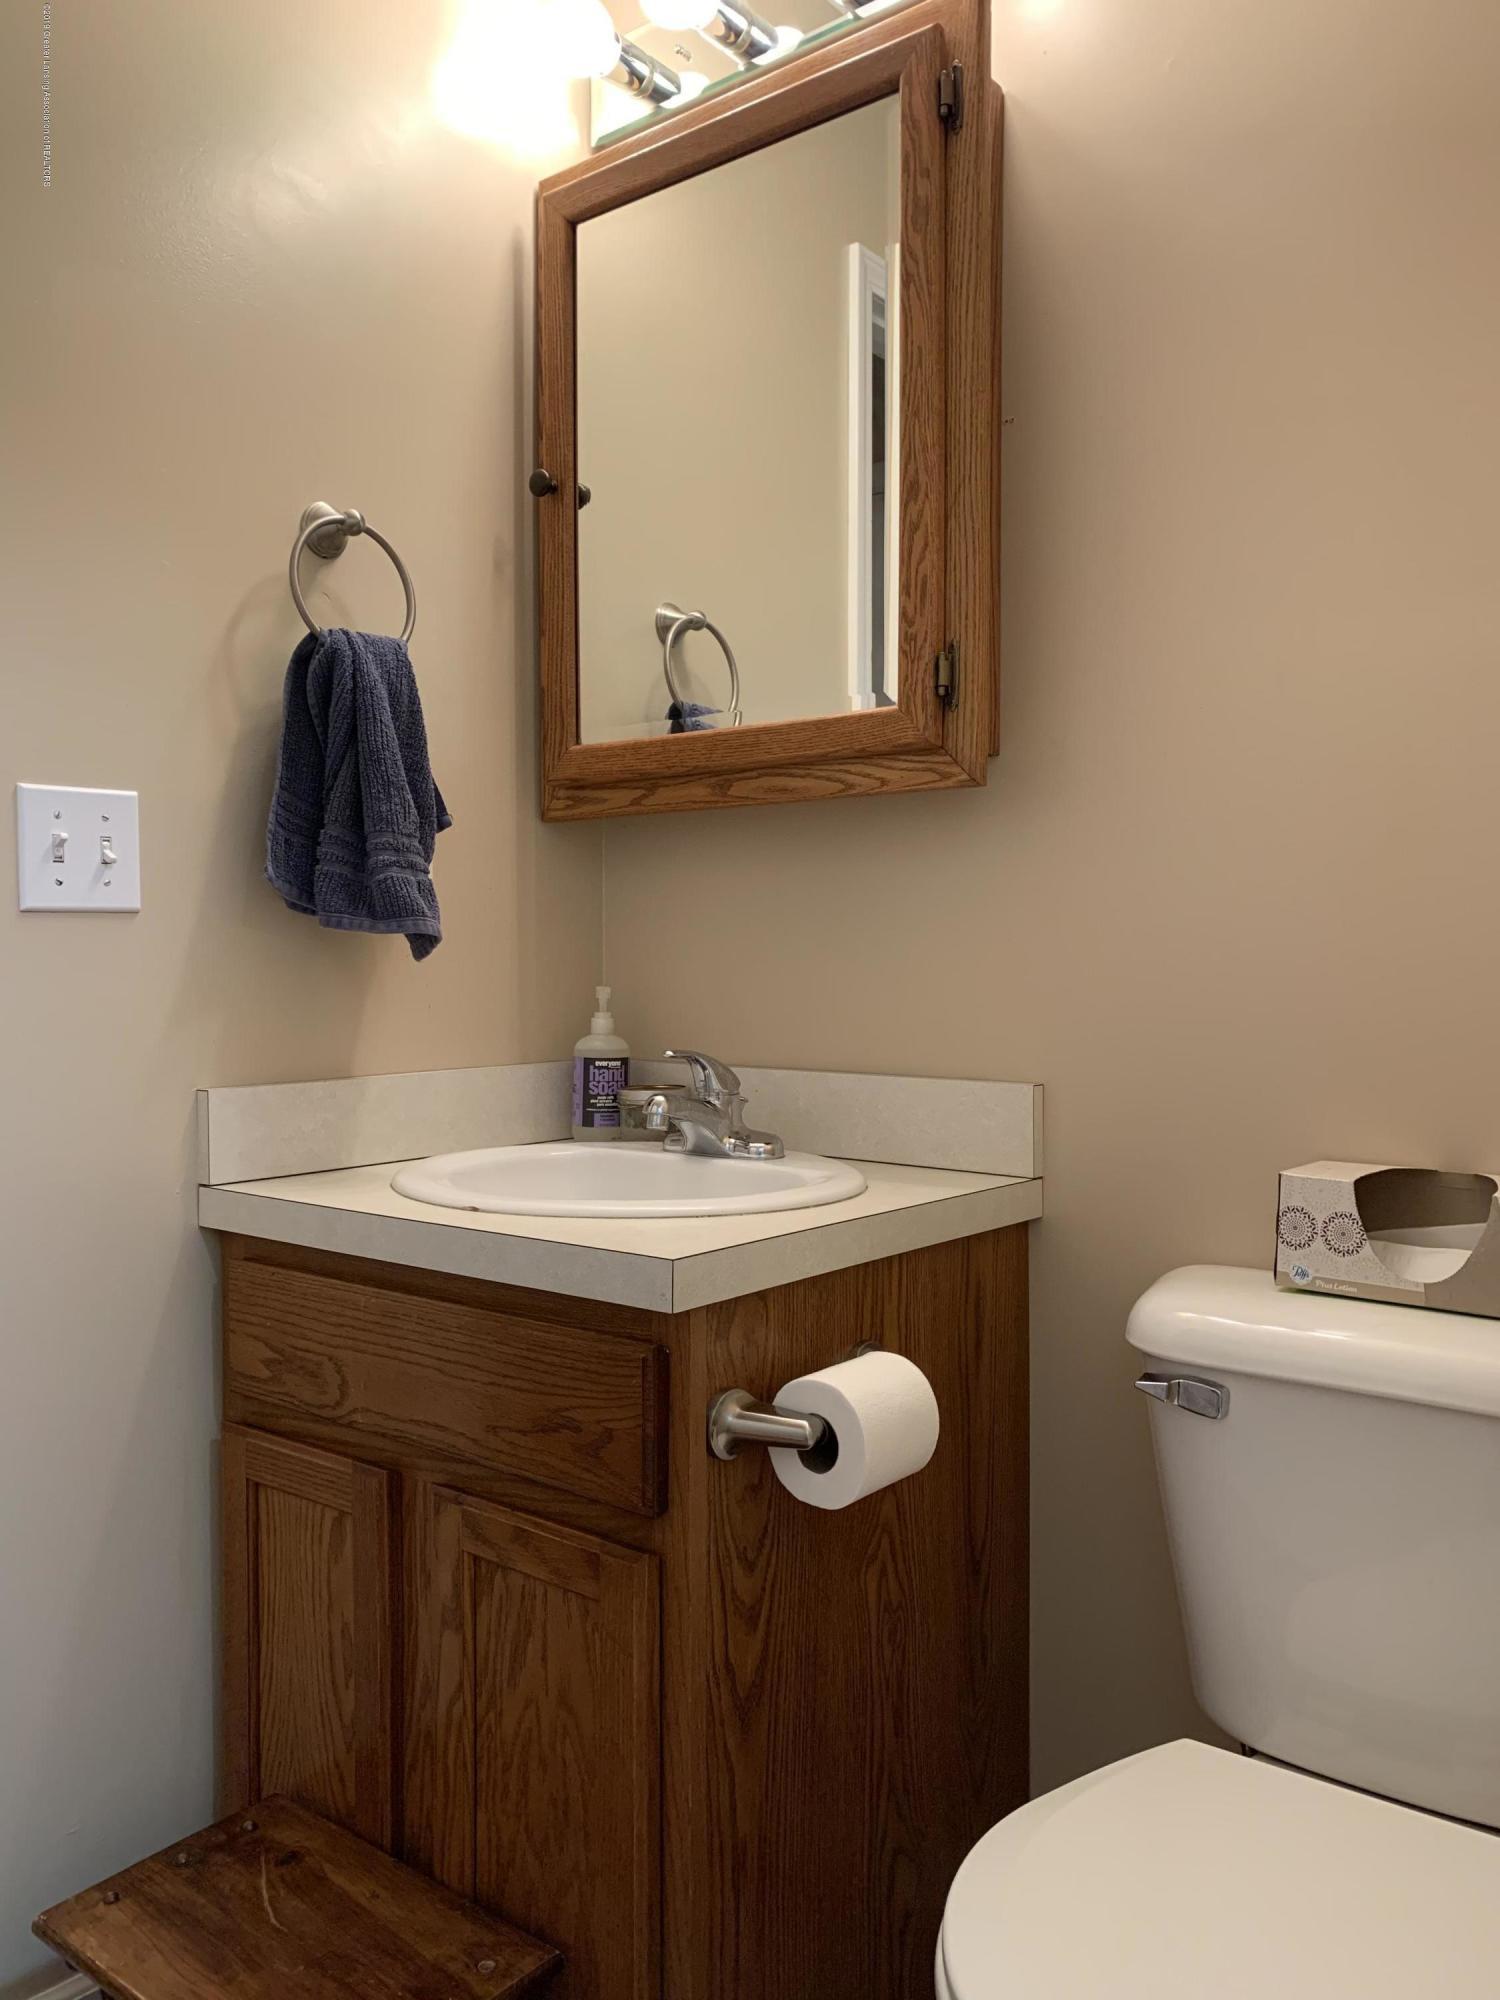 4157 W Roosevelt Rd - Half Bath 3 - 26